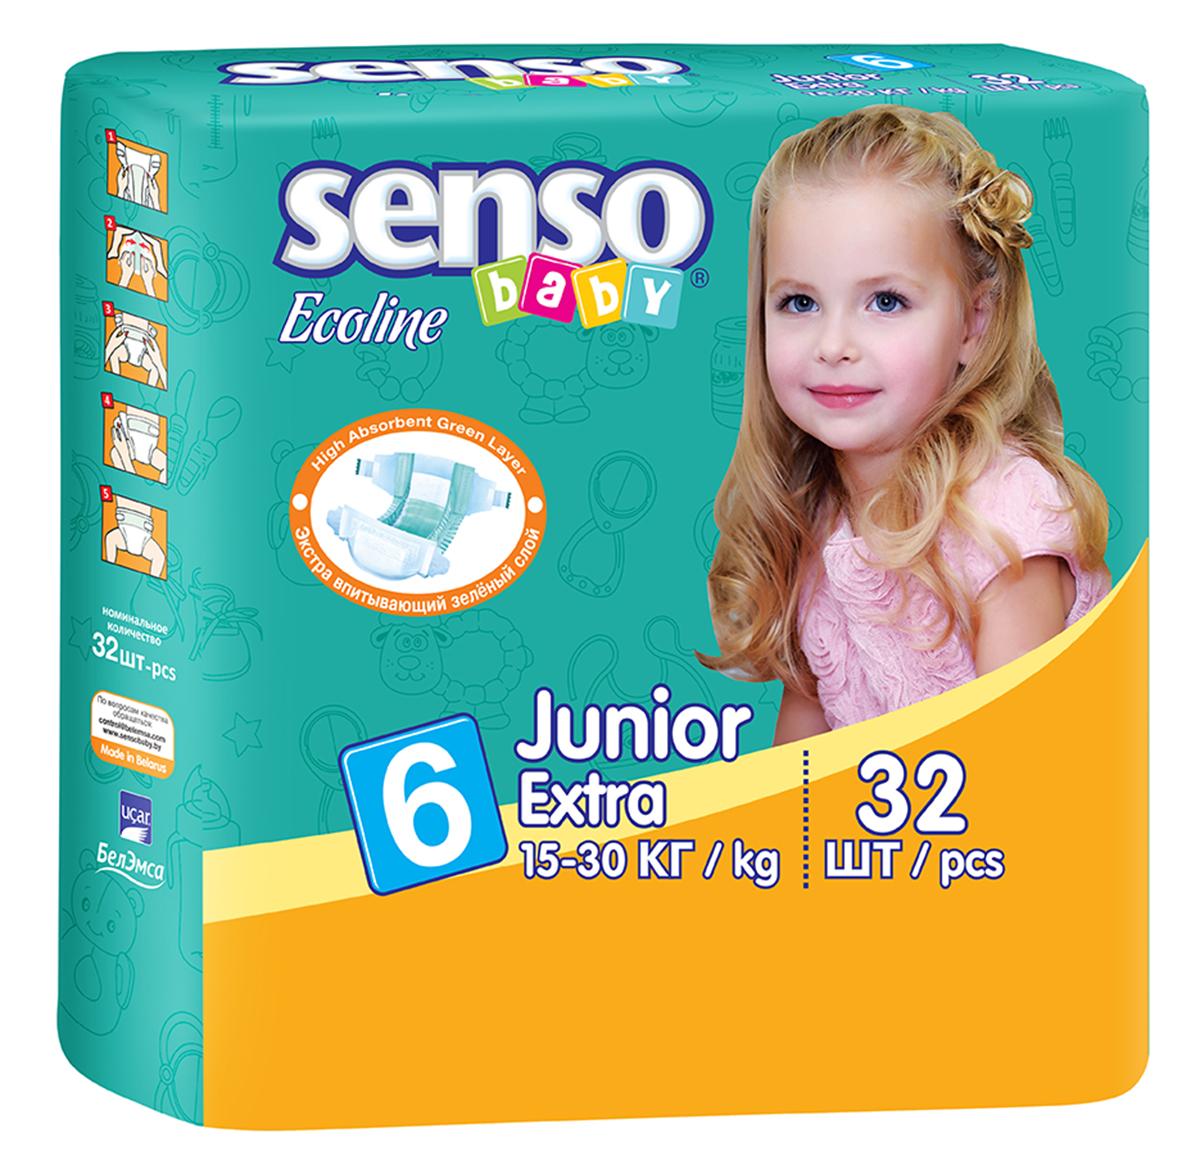 "Senso Baby Ecoline Подгузники Junior Extra 15-30 кг 32 шт, ООО ""БелЭмса"""